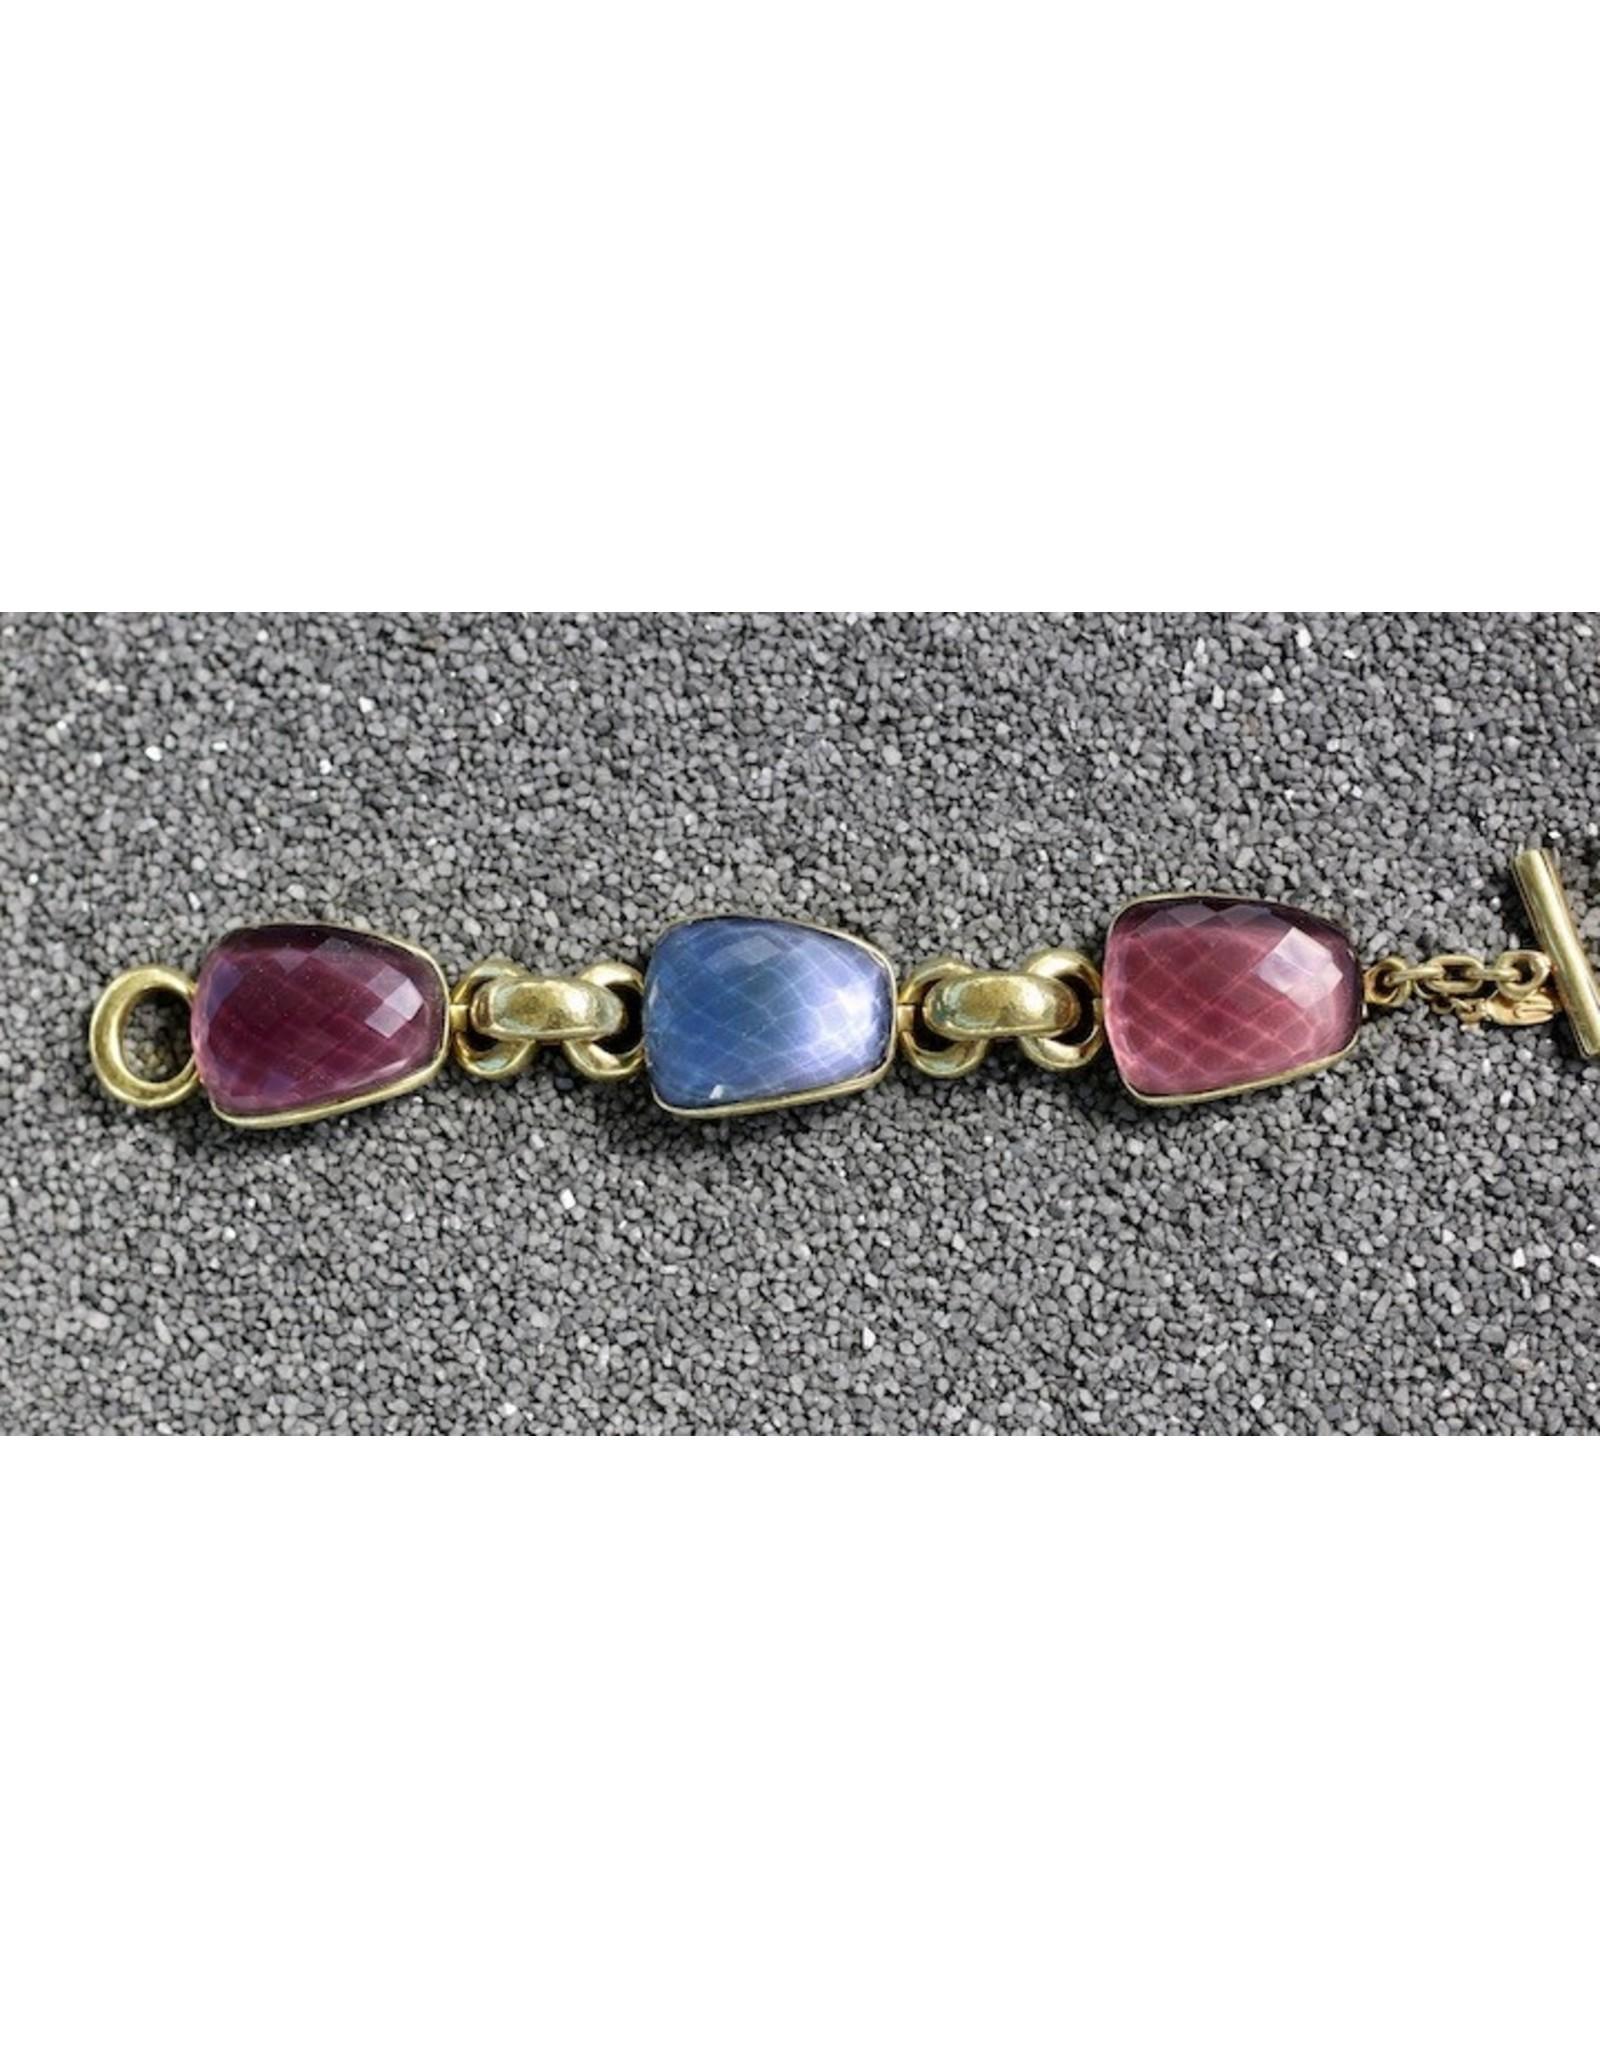 Vaubel Vermeil with Semi Precious Stones